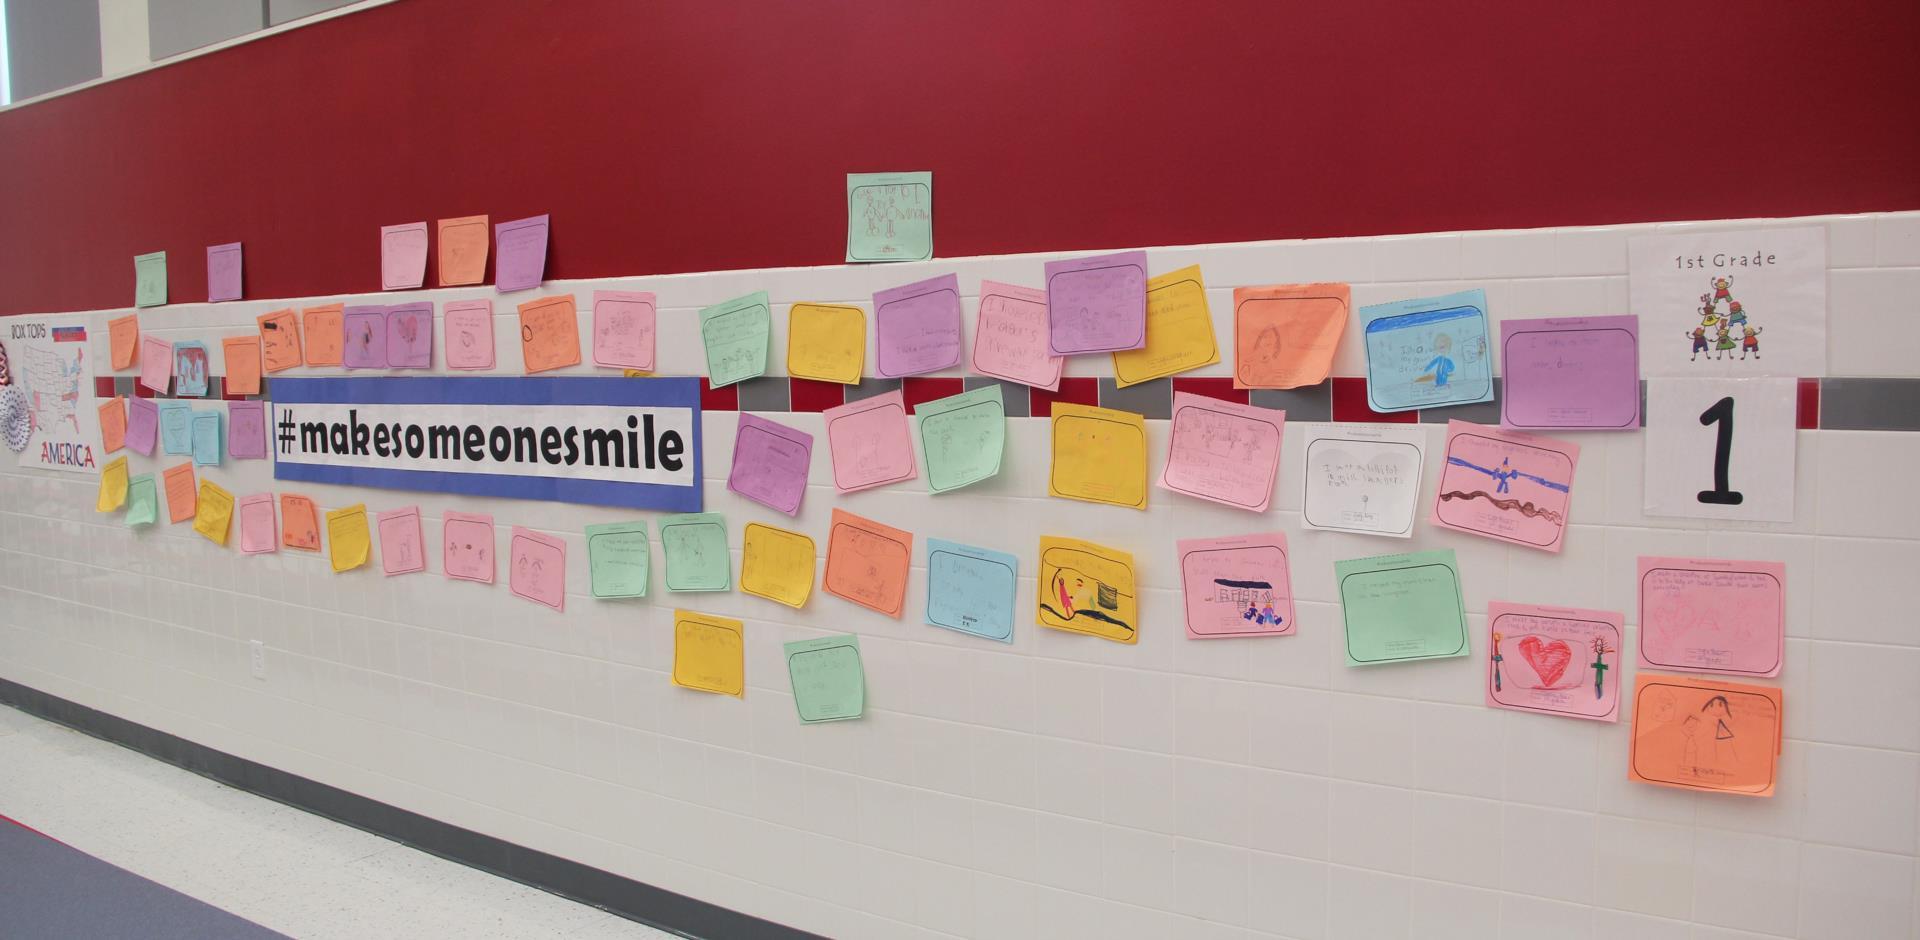 make someone smile wall